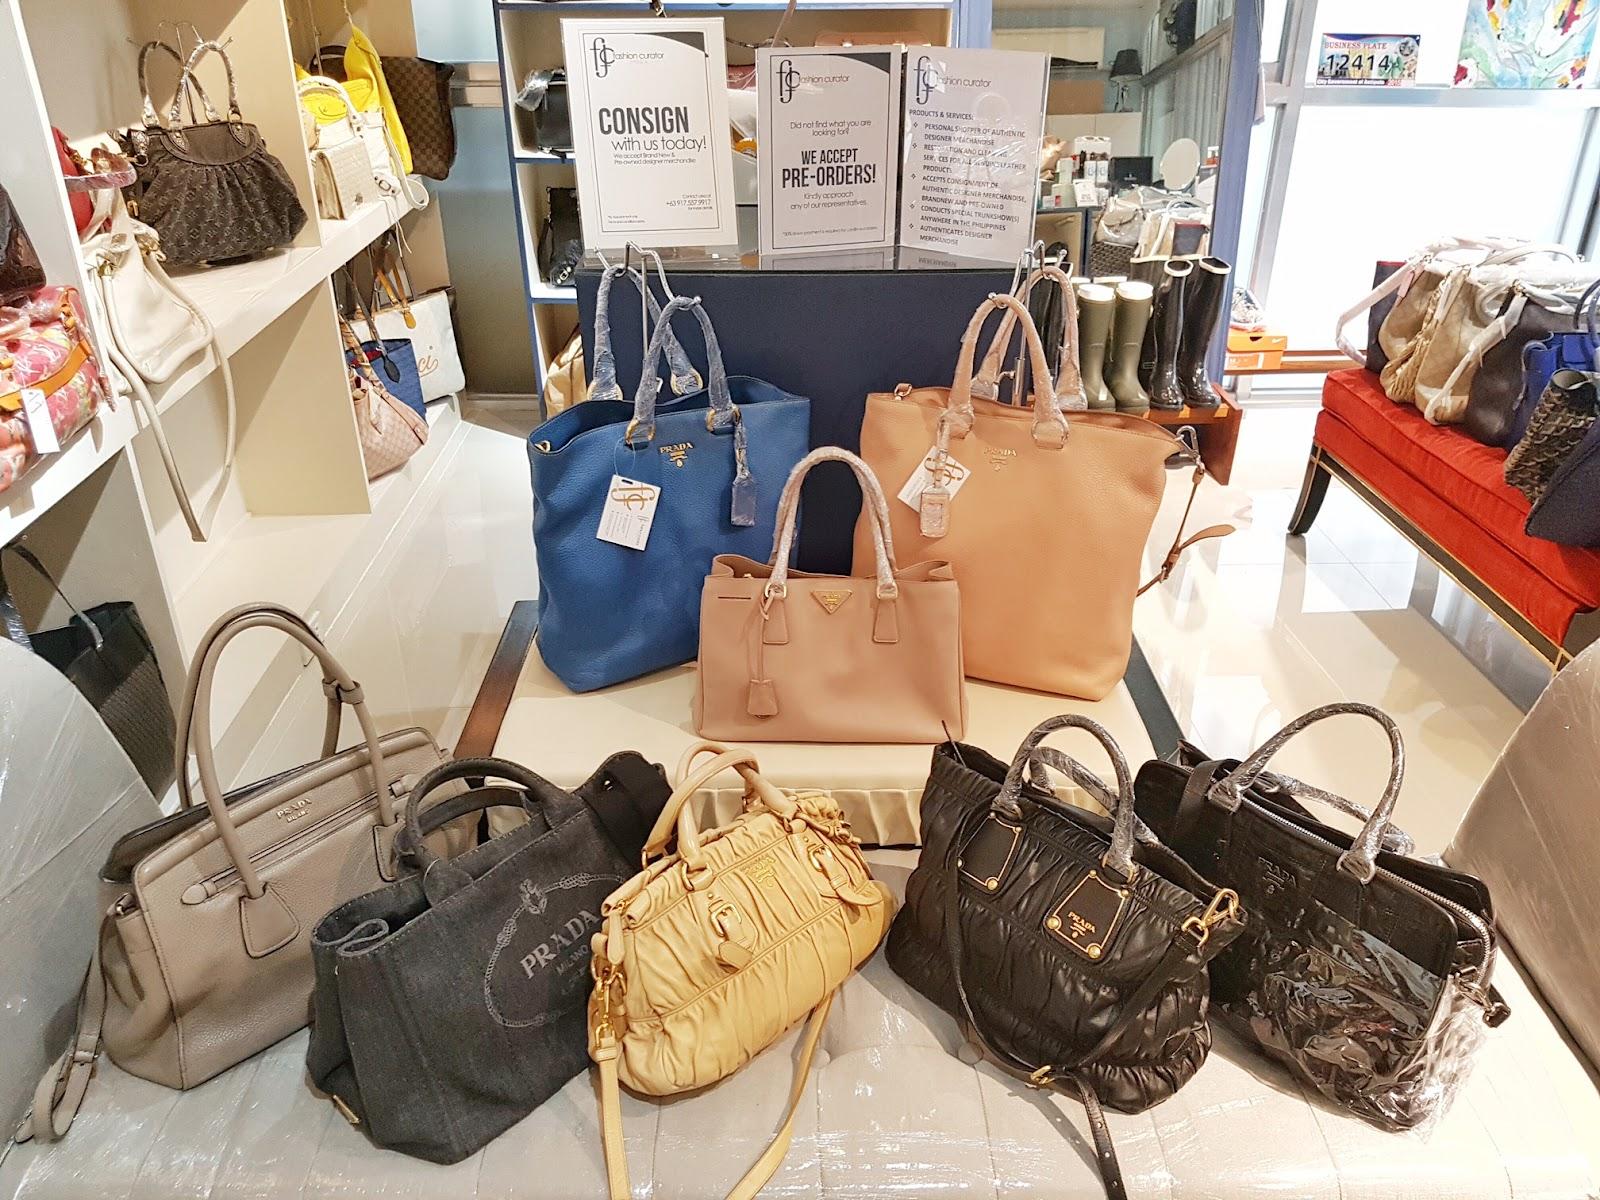 Cebu, Fashion Blogger, Beauty Blogger, Lifestyle, Luxury Items, Cebu Shops, Celine Mini Luggage, Cebu Events, Fashion Curator Manila, branded bags, for sale, Cebu trunk show, pop-up shop, branded preloved bags,